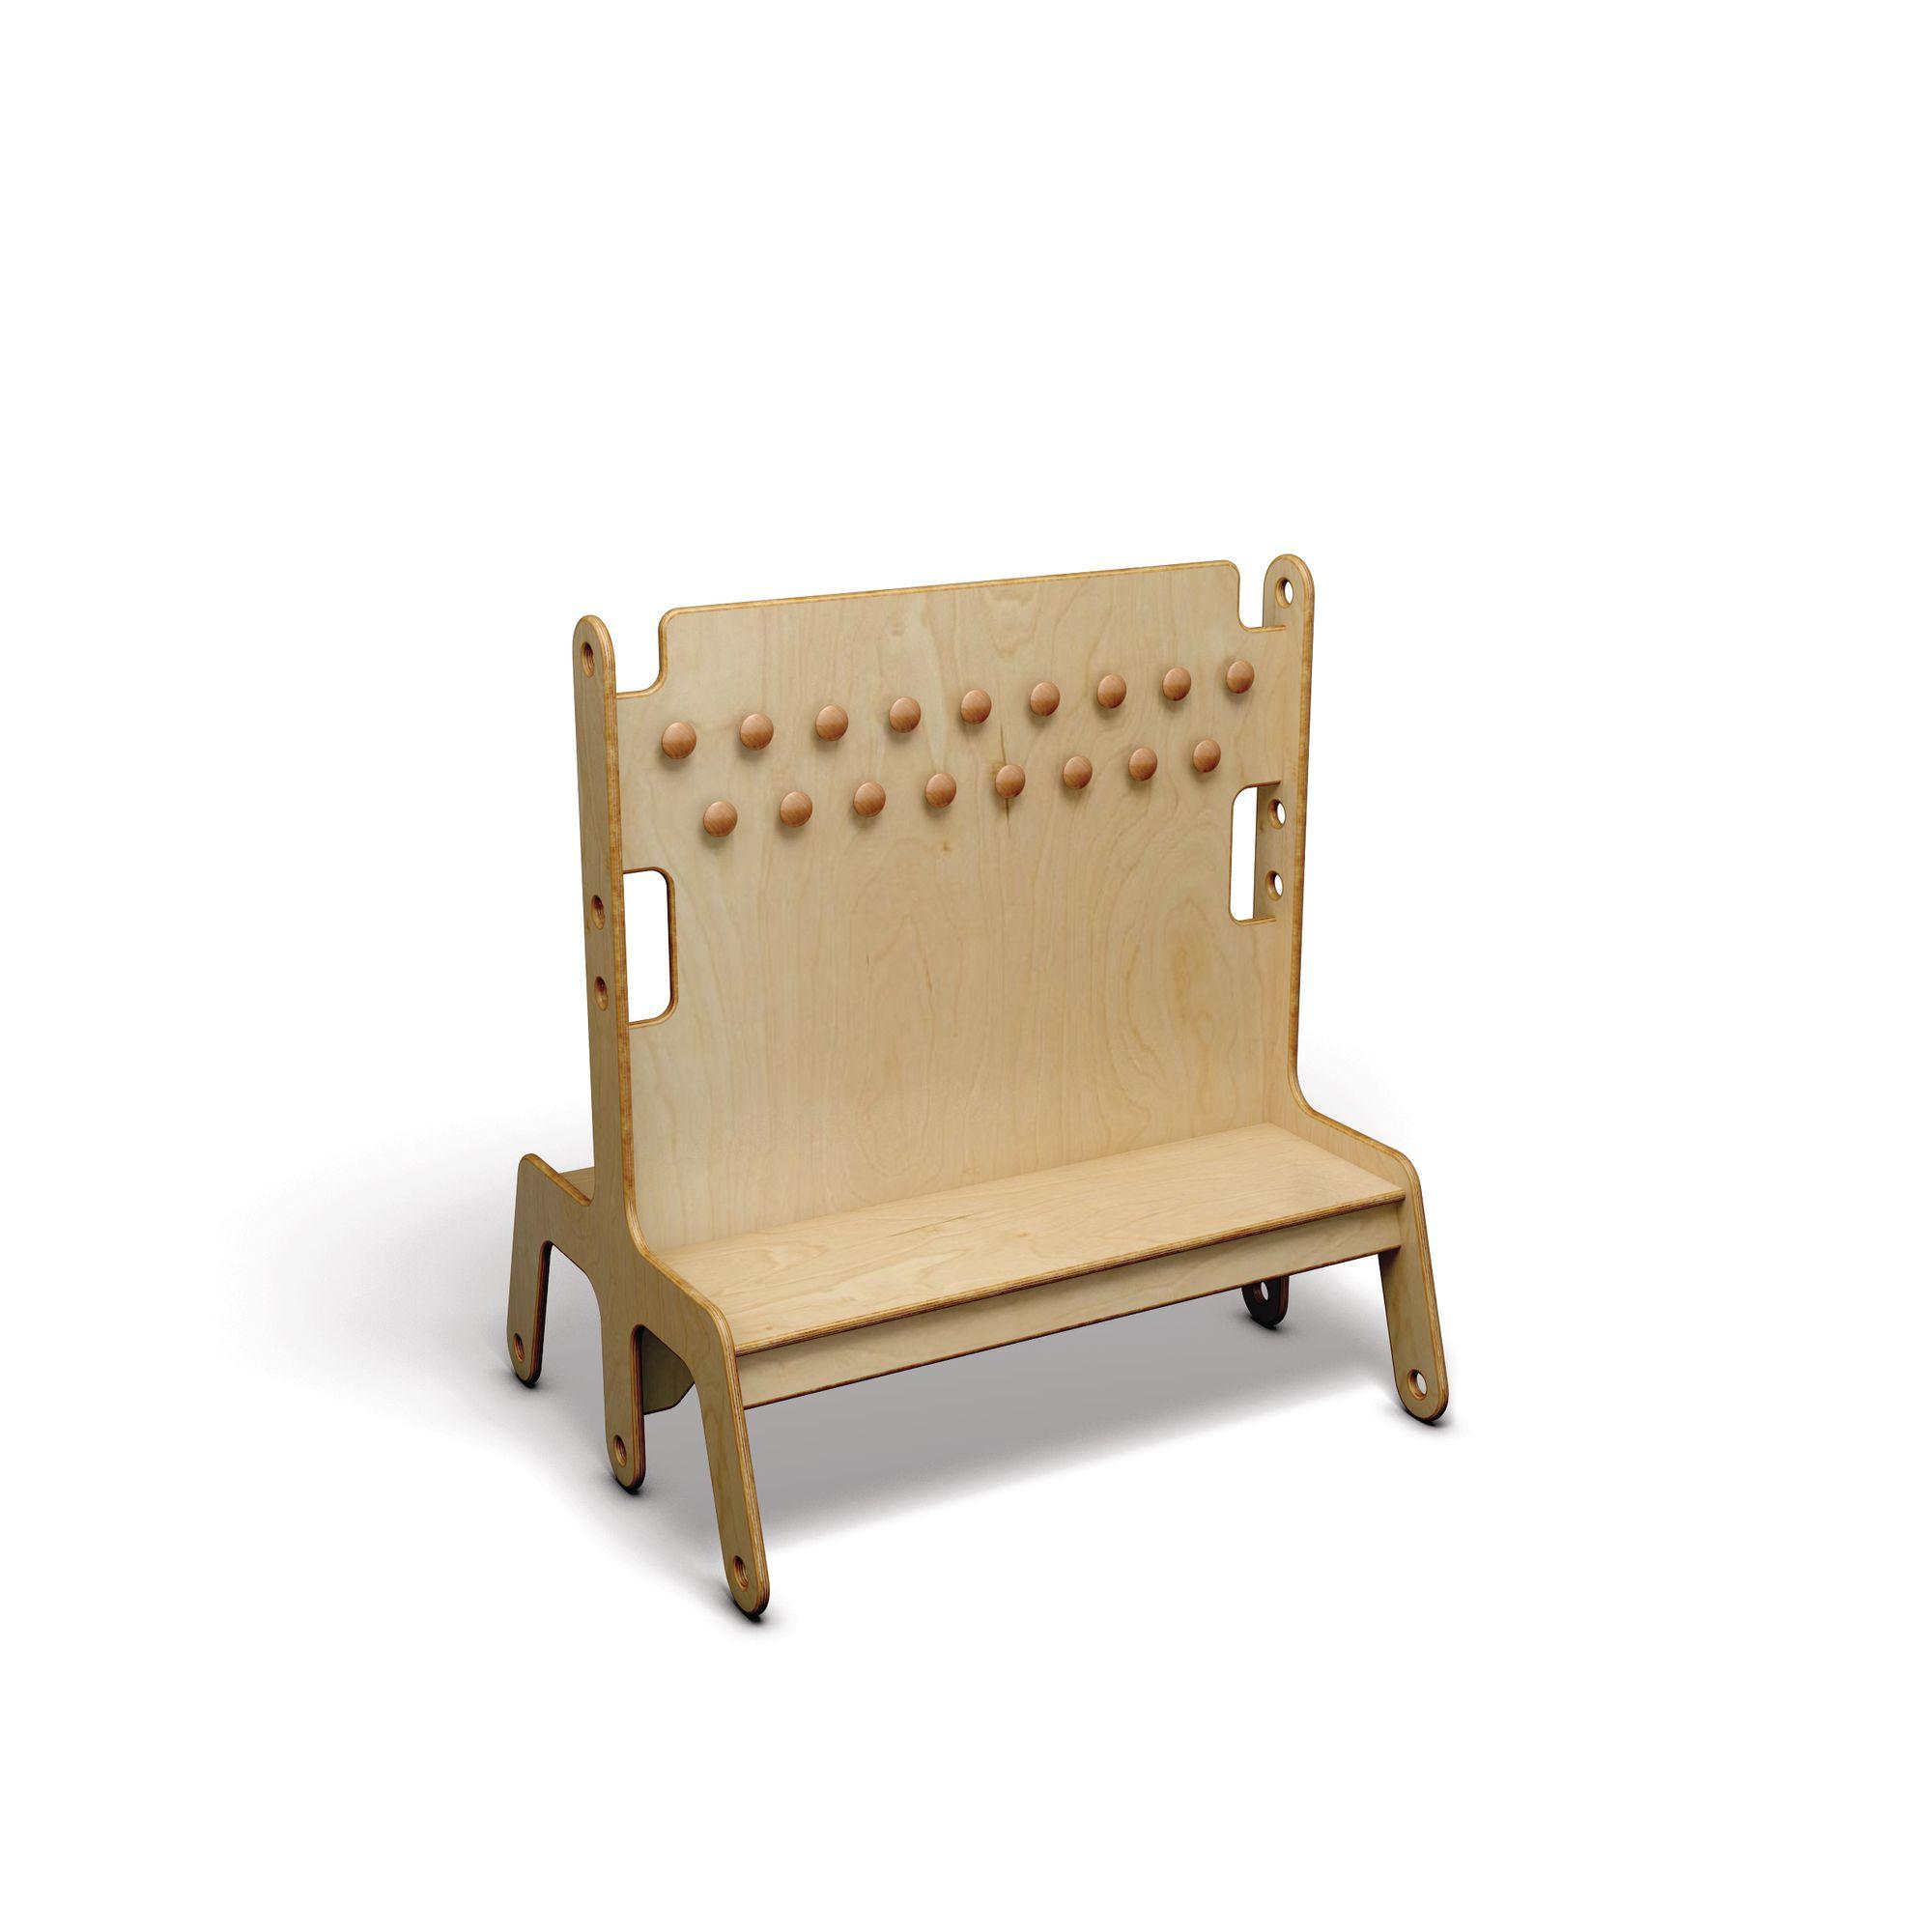 Fantastic Trudy Nursery Low Level Cloak Unit Double 34 Hooks Uwap Interior Chair Design Uwaporg